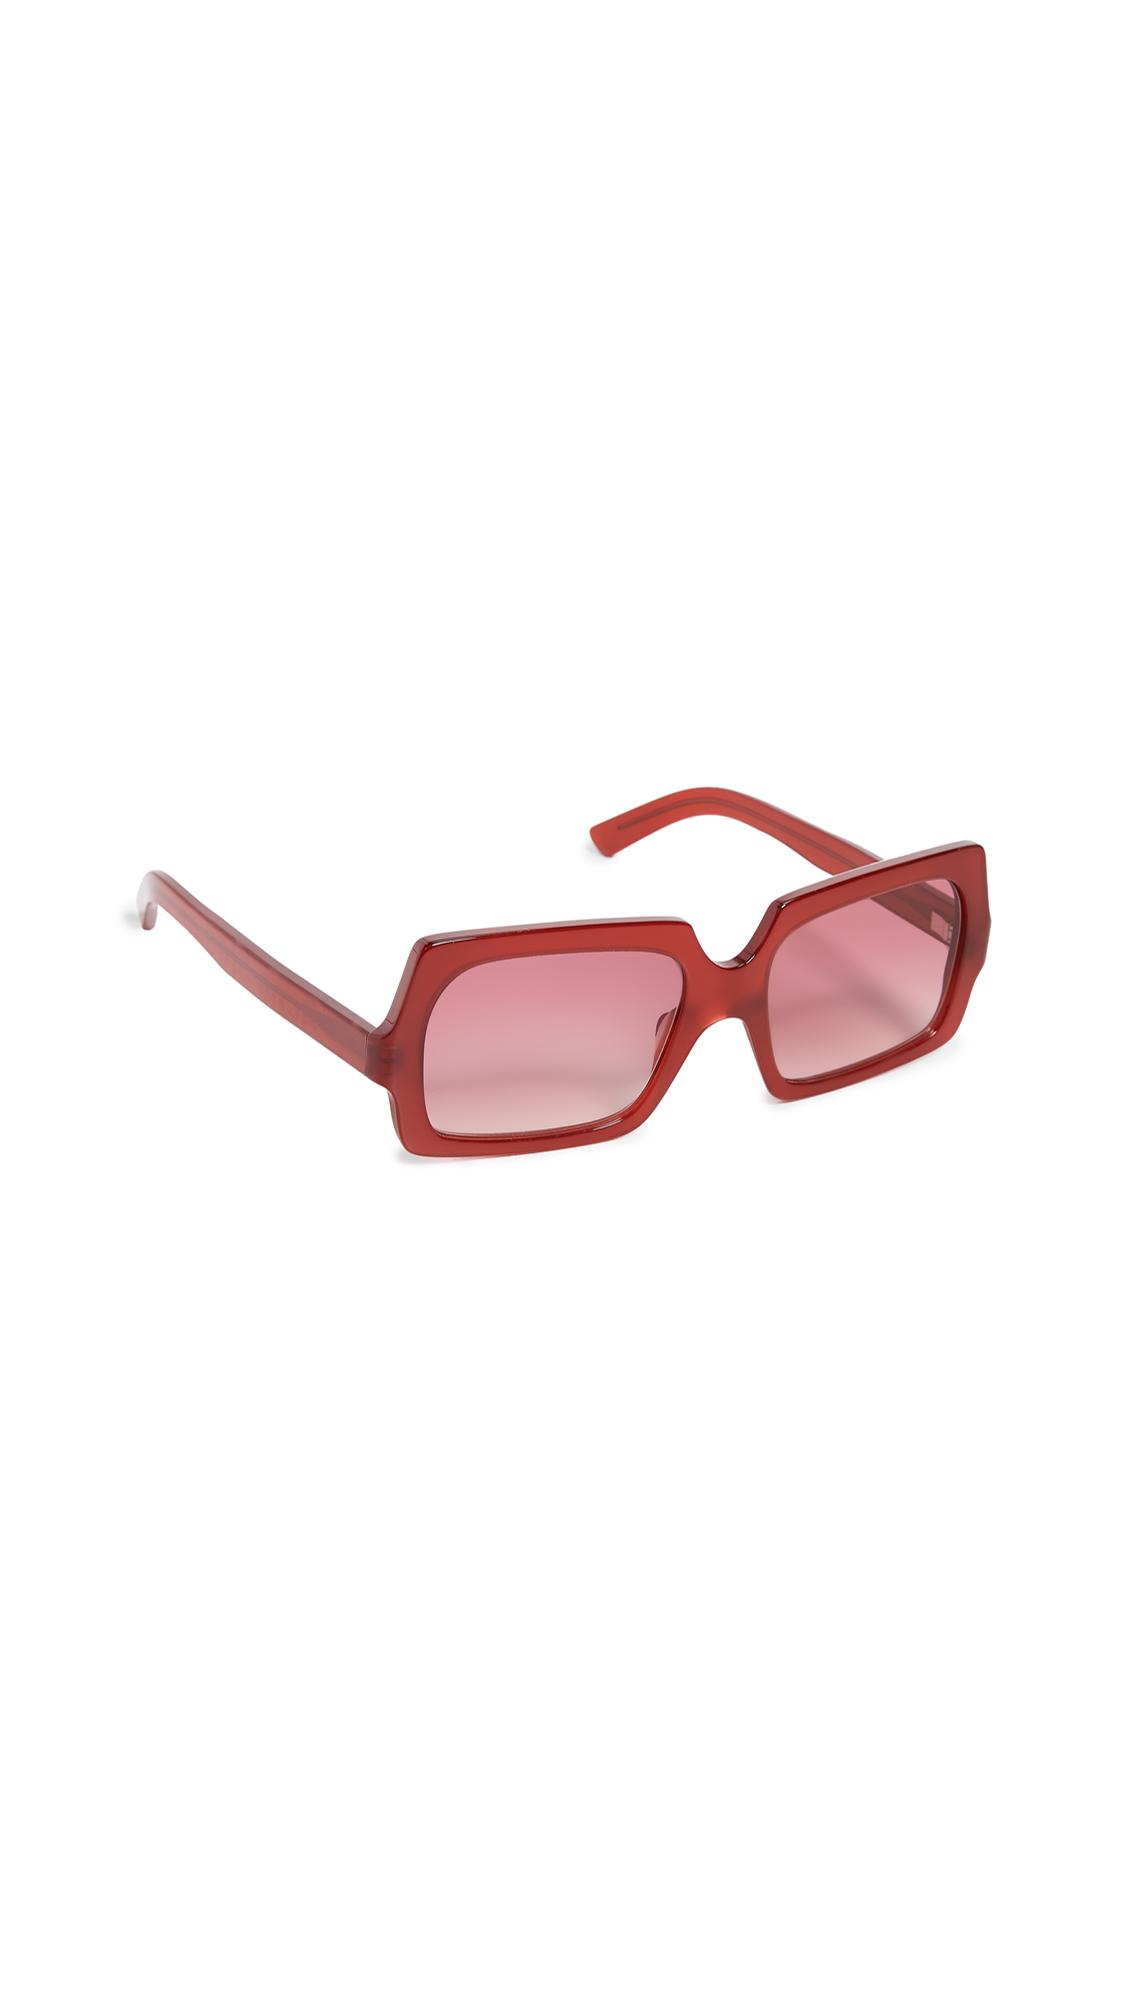 Acne Studios George Large Sunglasses - Burgundy/Burgundy